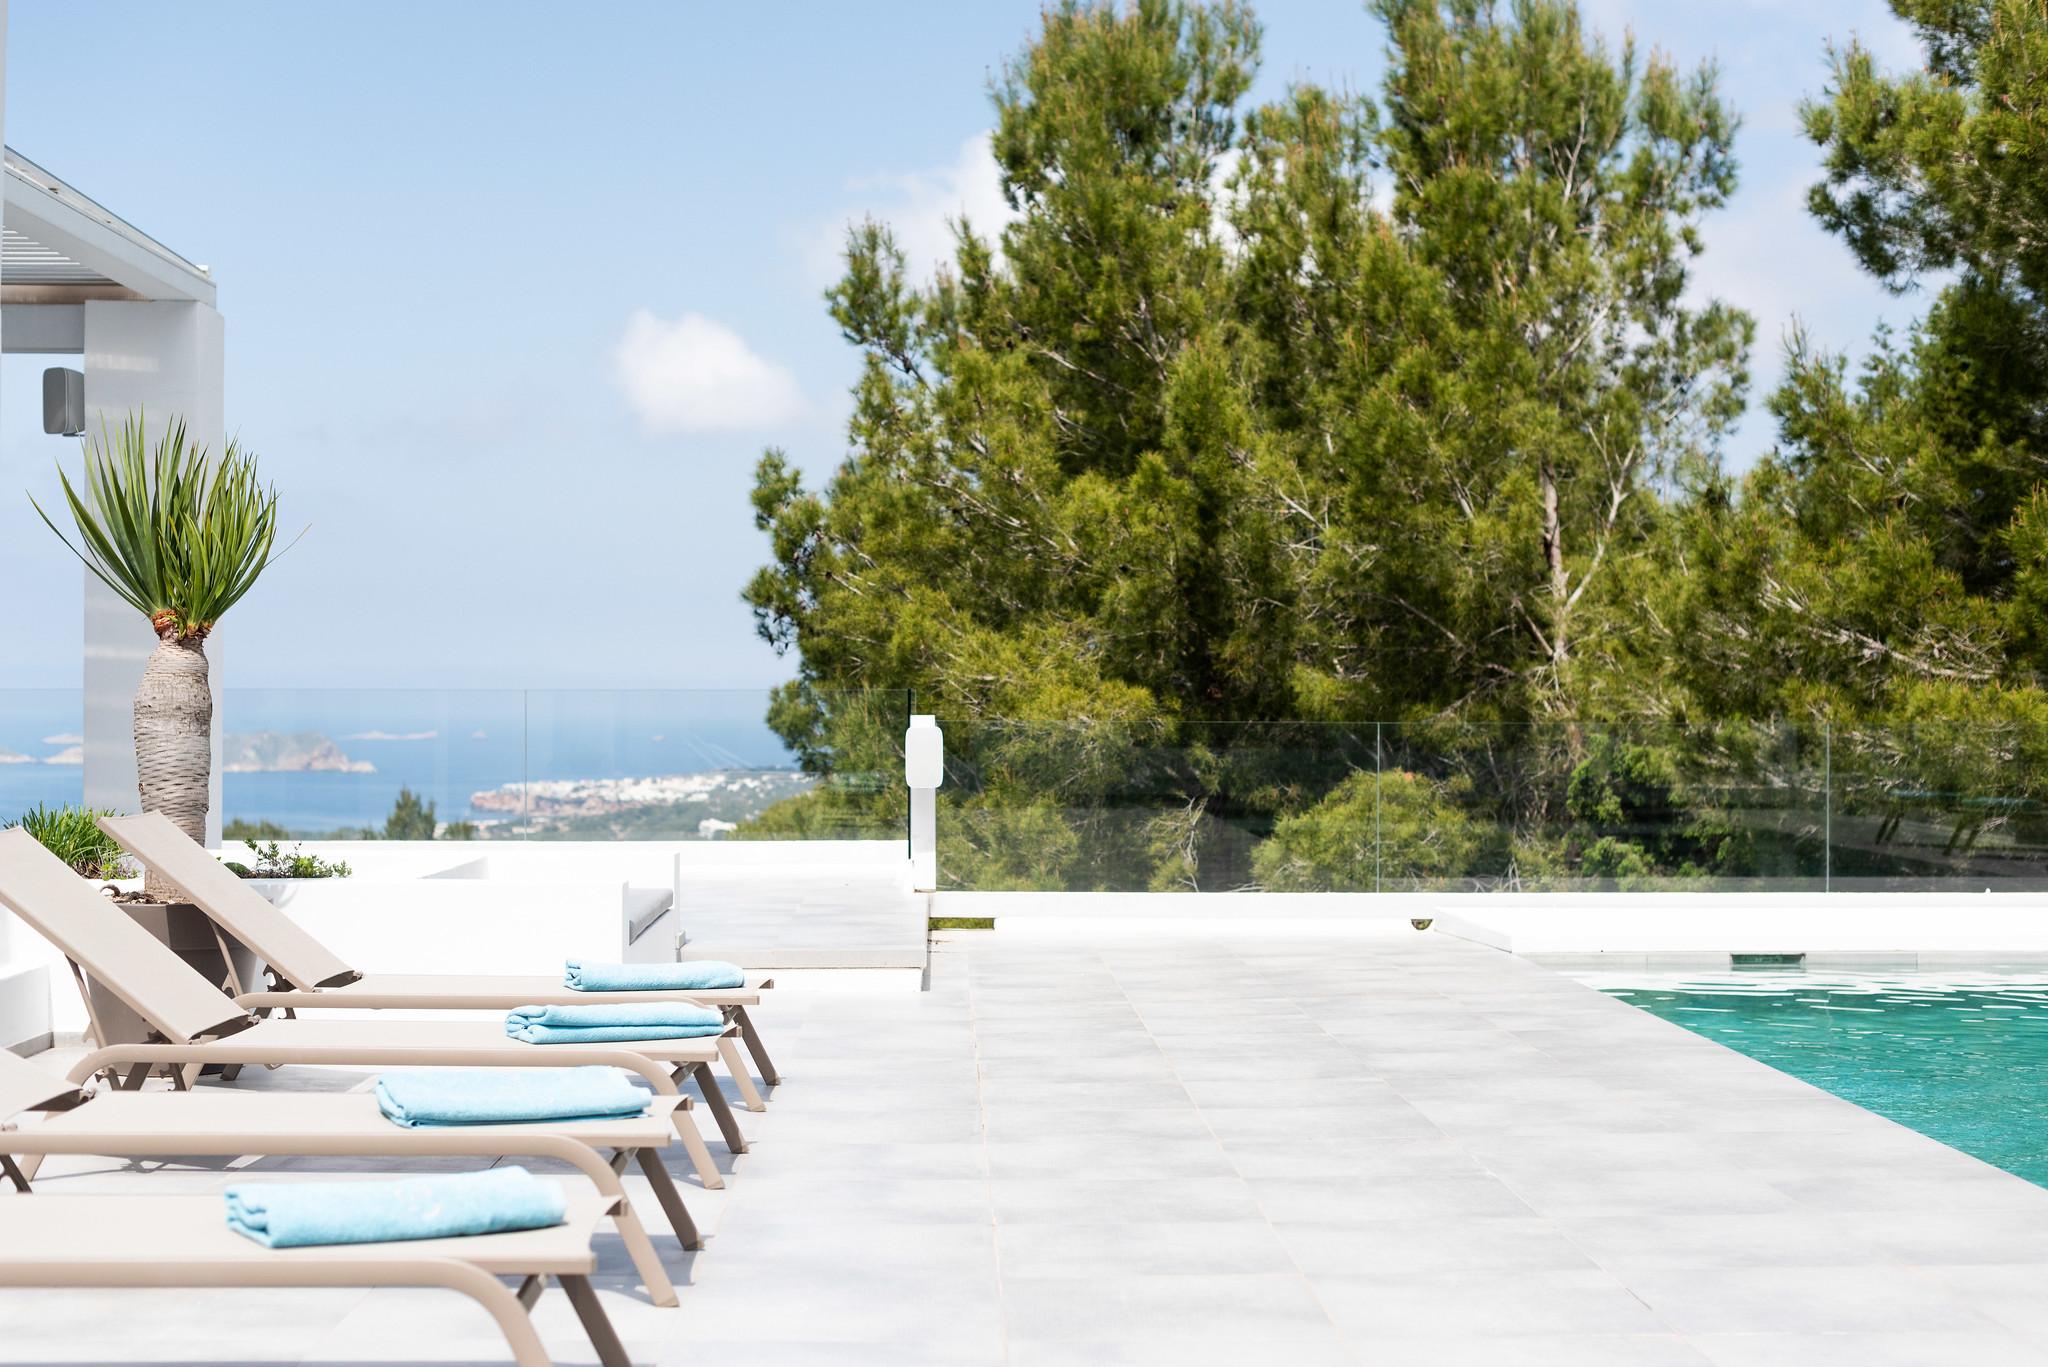 https://www.white-ibiza.com/wp-content/uploads/2020/05/white-ibiza-villas-can-dela-poolside.jpg